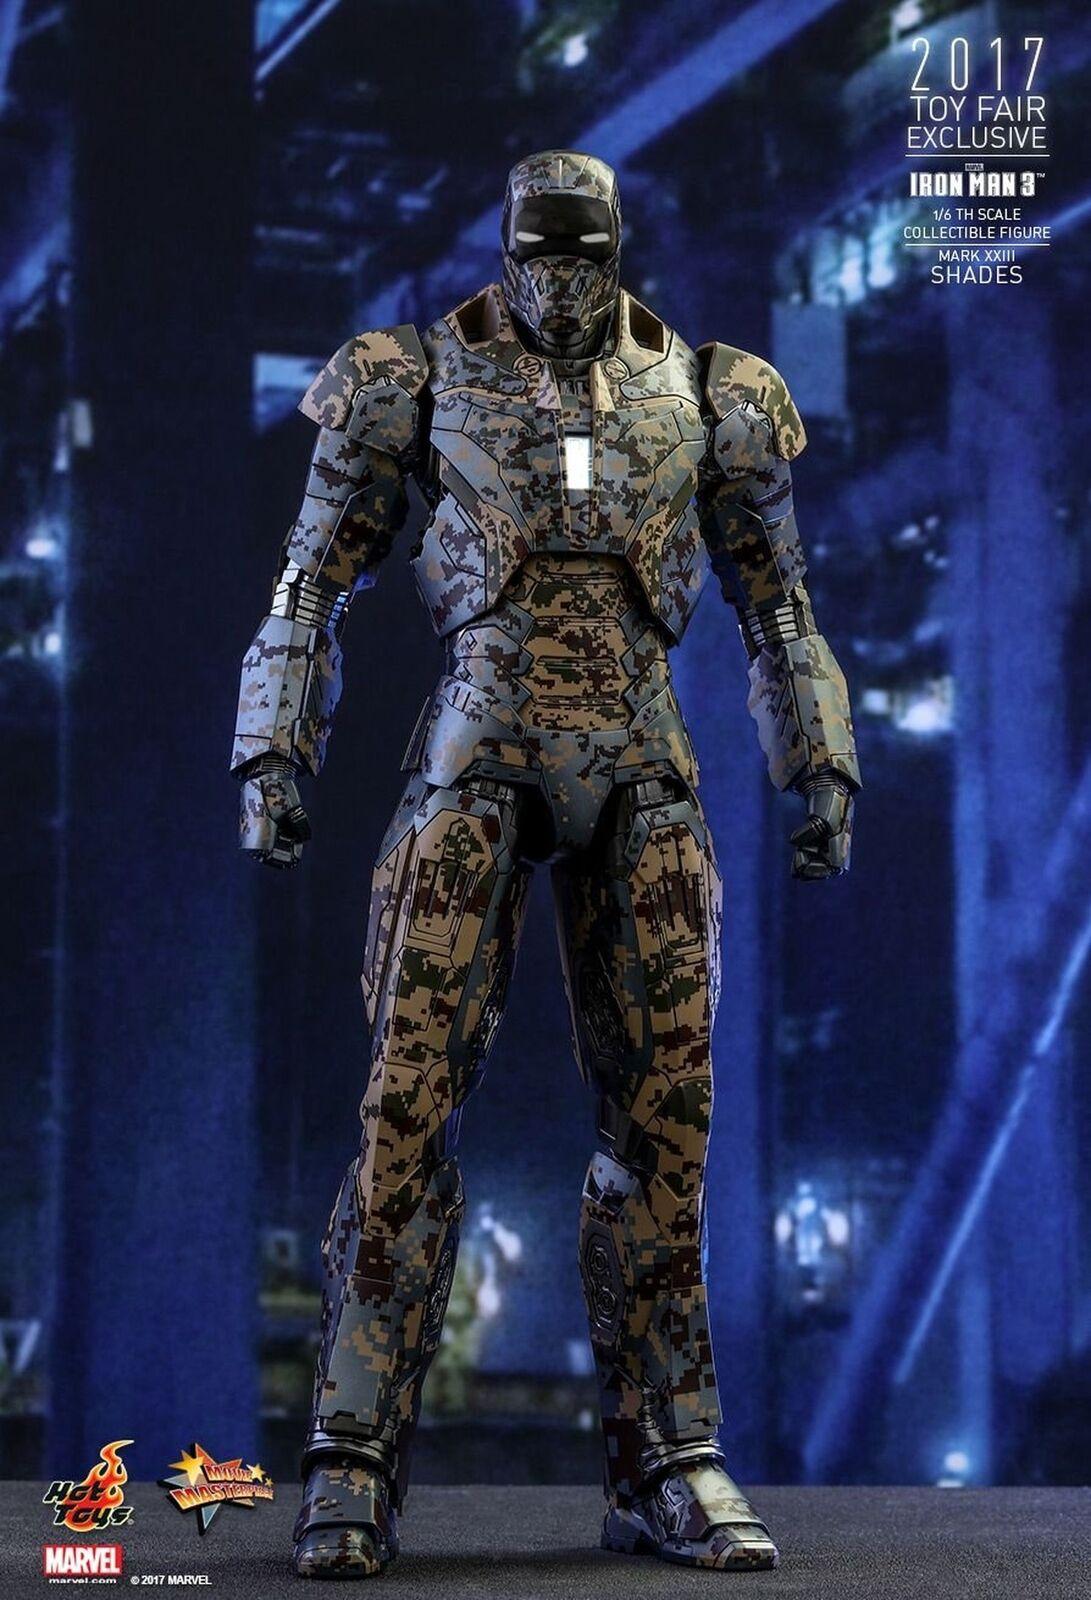 Hot Toys HT903062 Iron Man Mark XXIII  Shades  Figure, 1 6 Scale